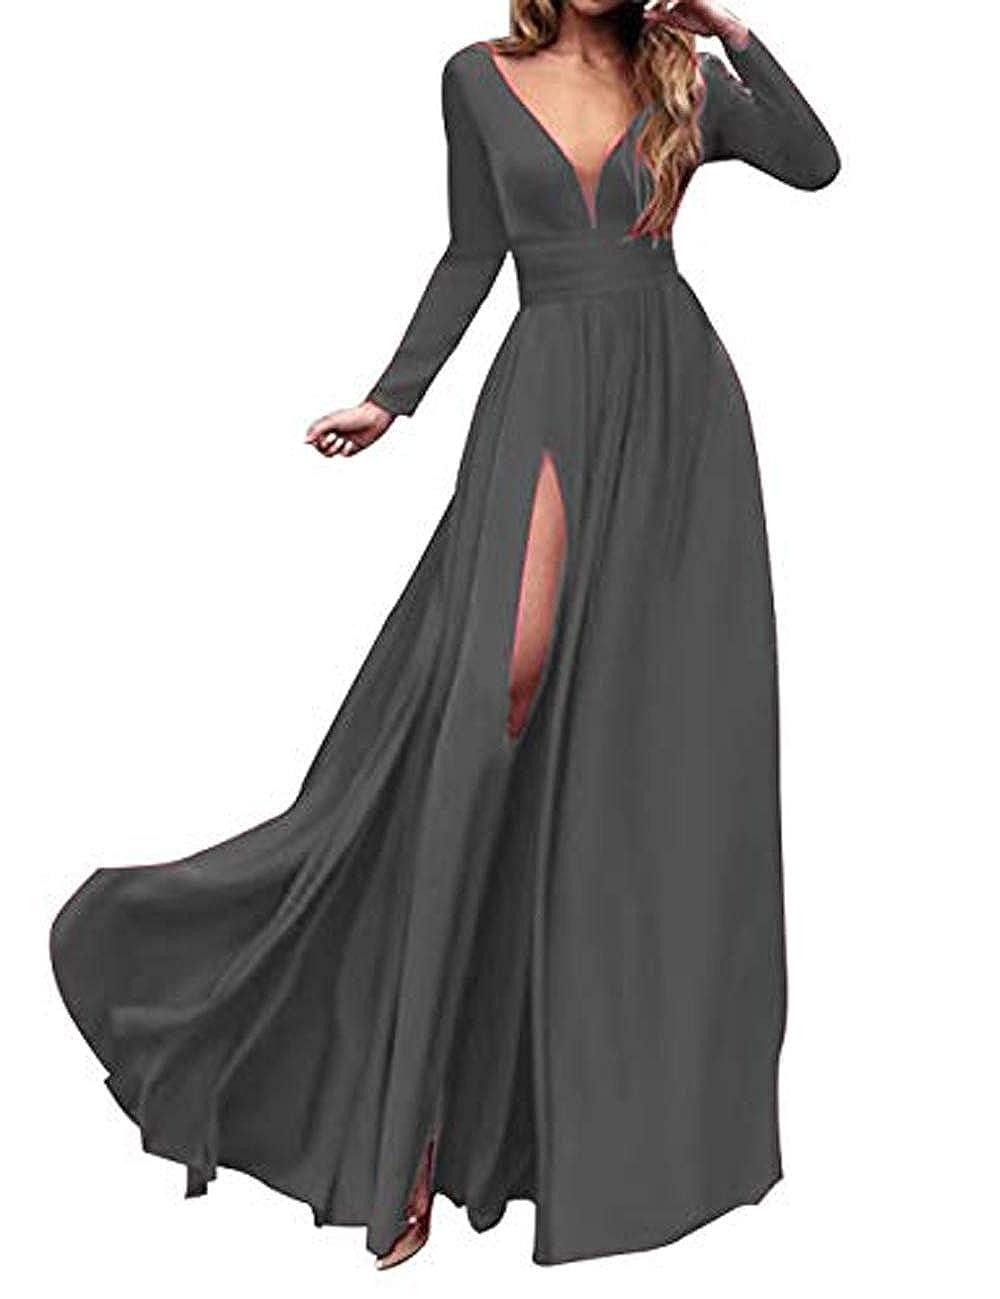 3style Grey MariRobe Women's High Split Evening Dress Deep V Neck Prom Gown Long Sleeve Party Gown